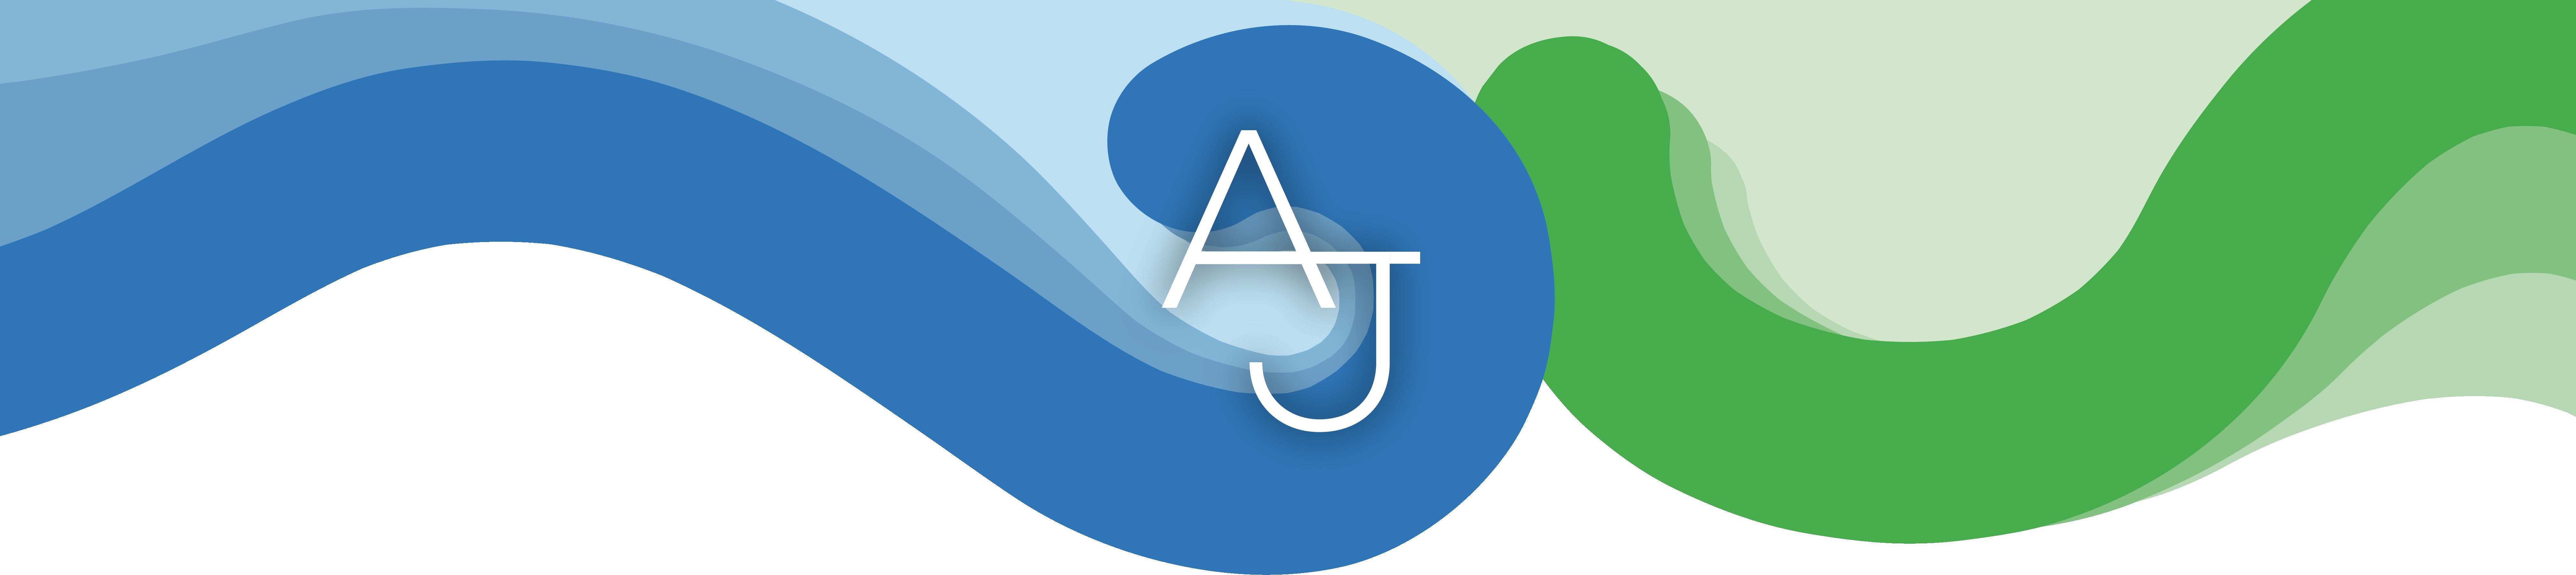 A.J. Environnement